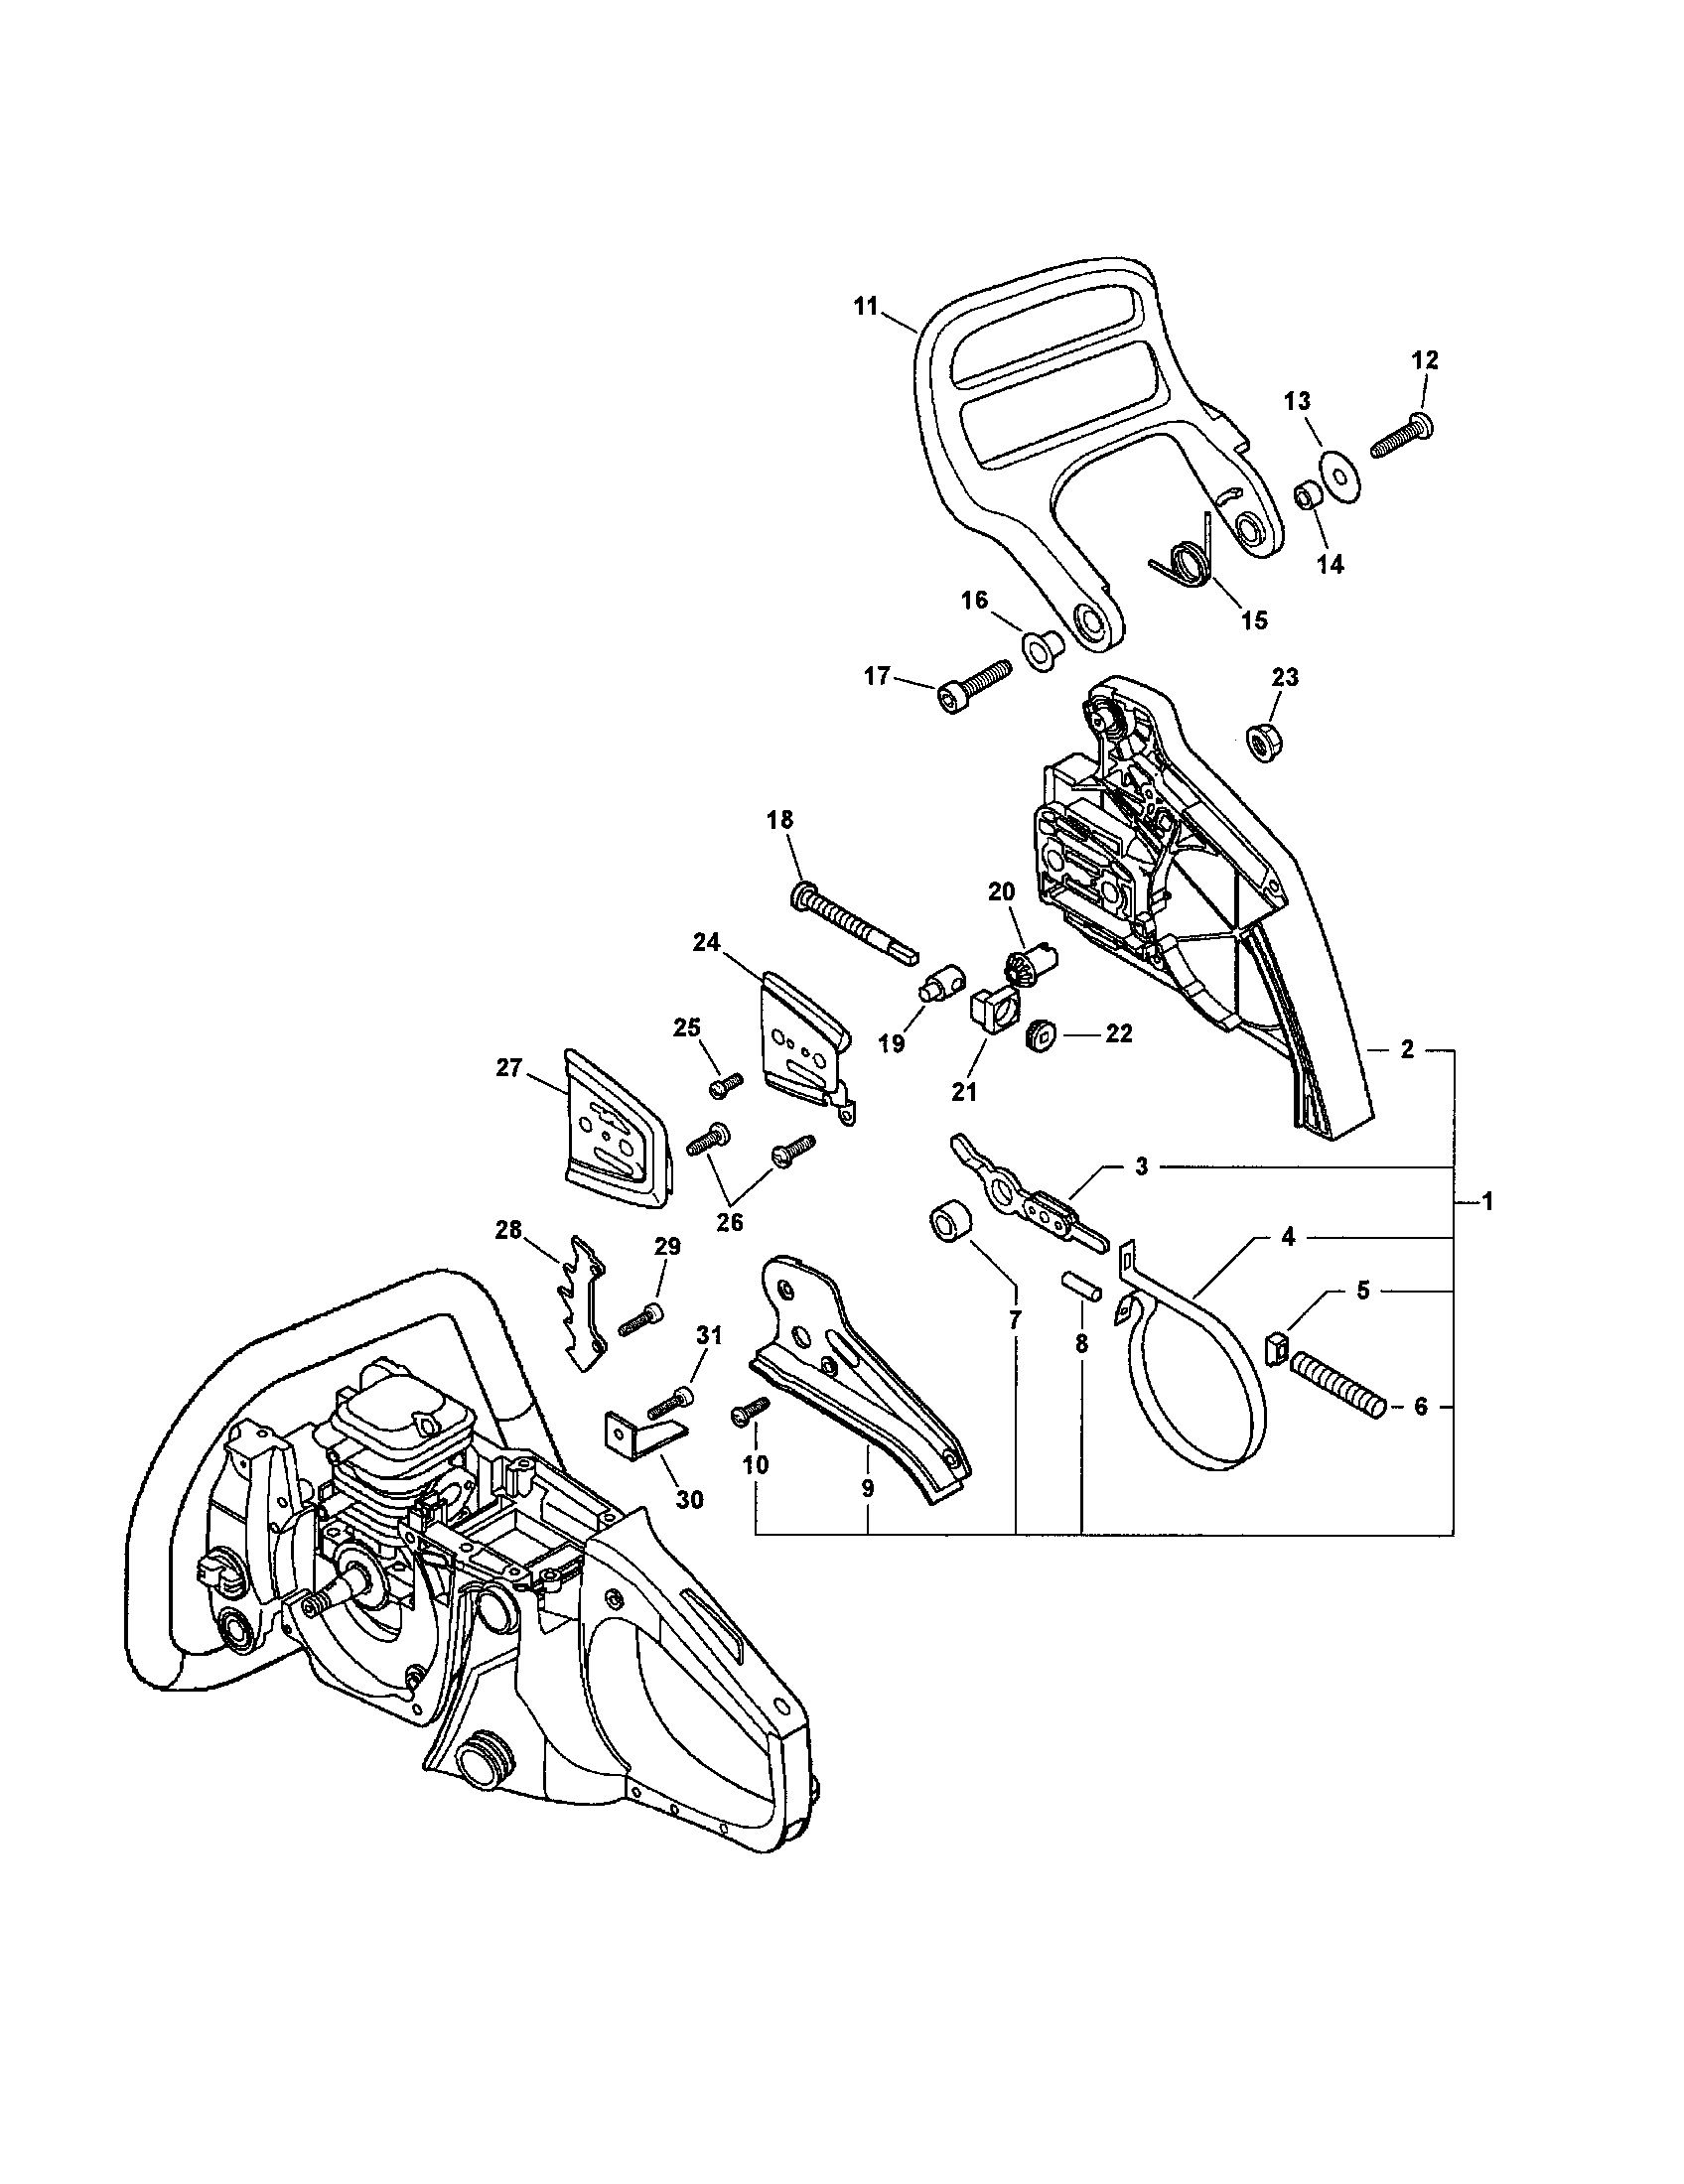 CHAIN BRAKE Diagram & Parts List for Model cs400 Echo